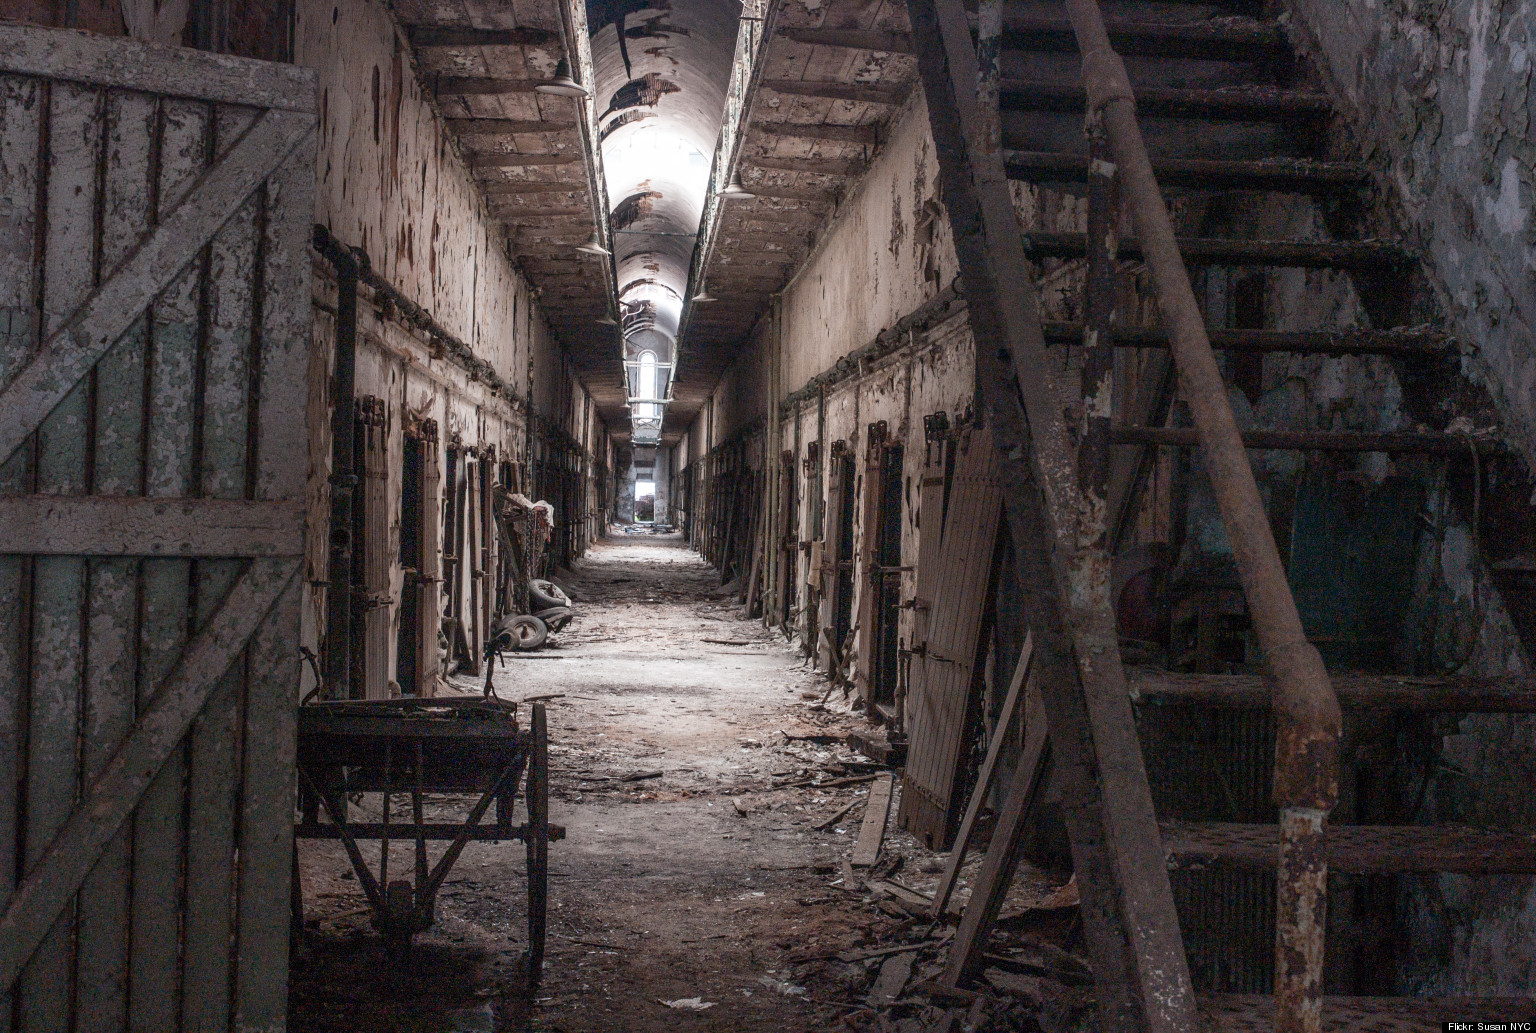 haunted prison tours put boredom behind bars shermans travel